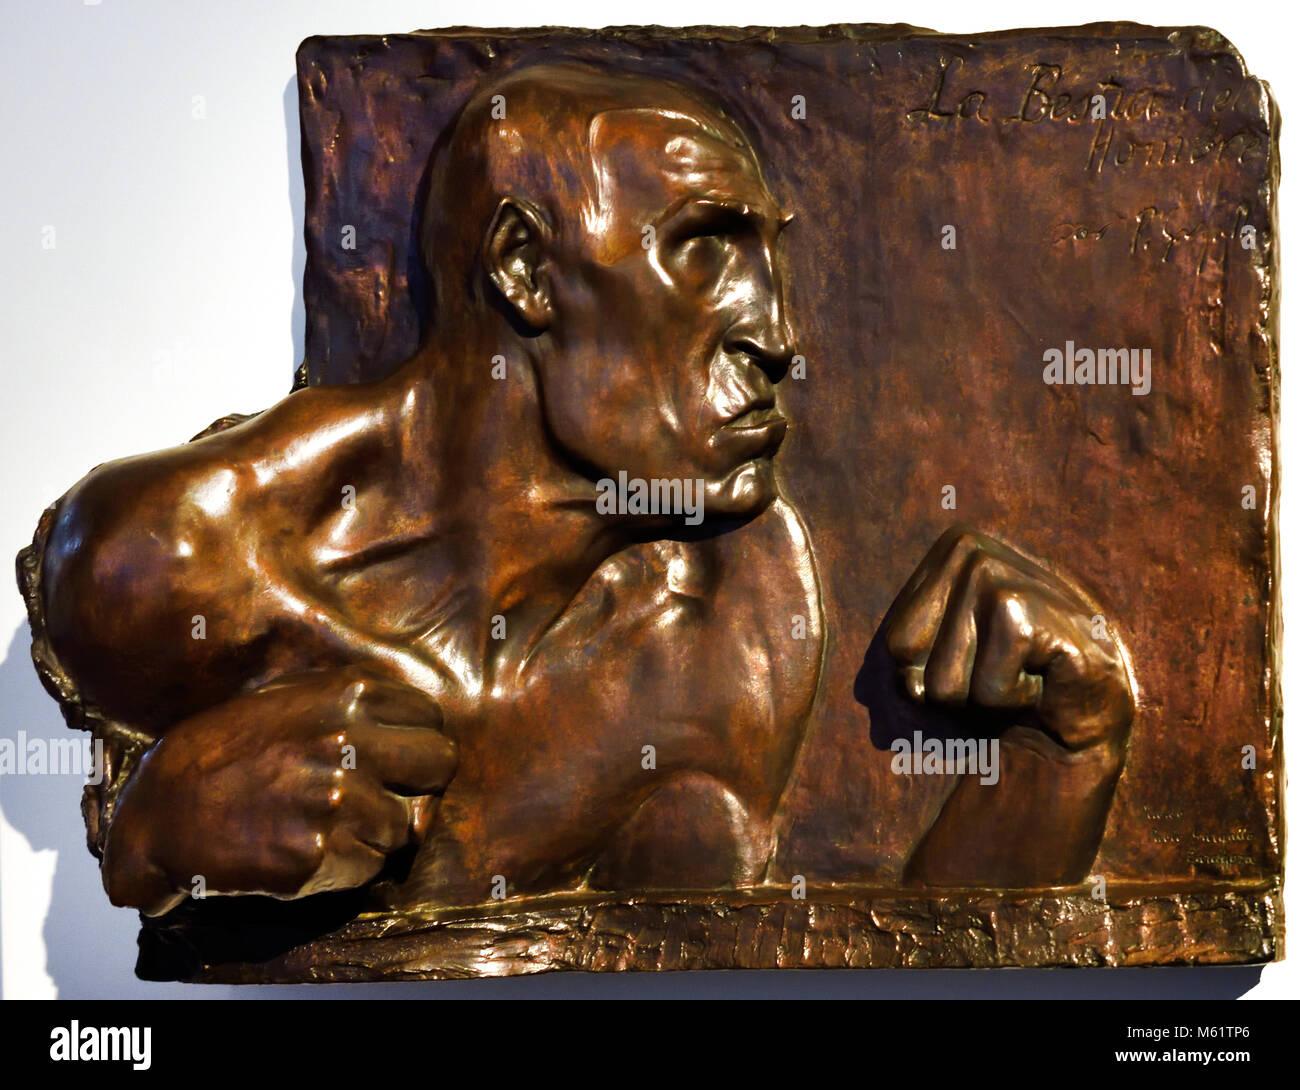 La Bestia del Hombre - The Beast of Man 1904 Pablo Emilio Gargallo (1881 – 1934) was a Spanish sculptor and painter - Stock Image